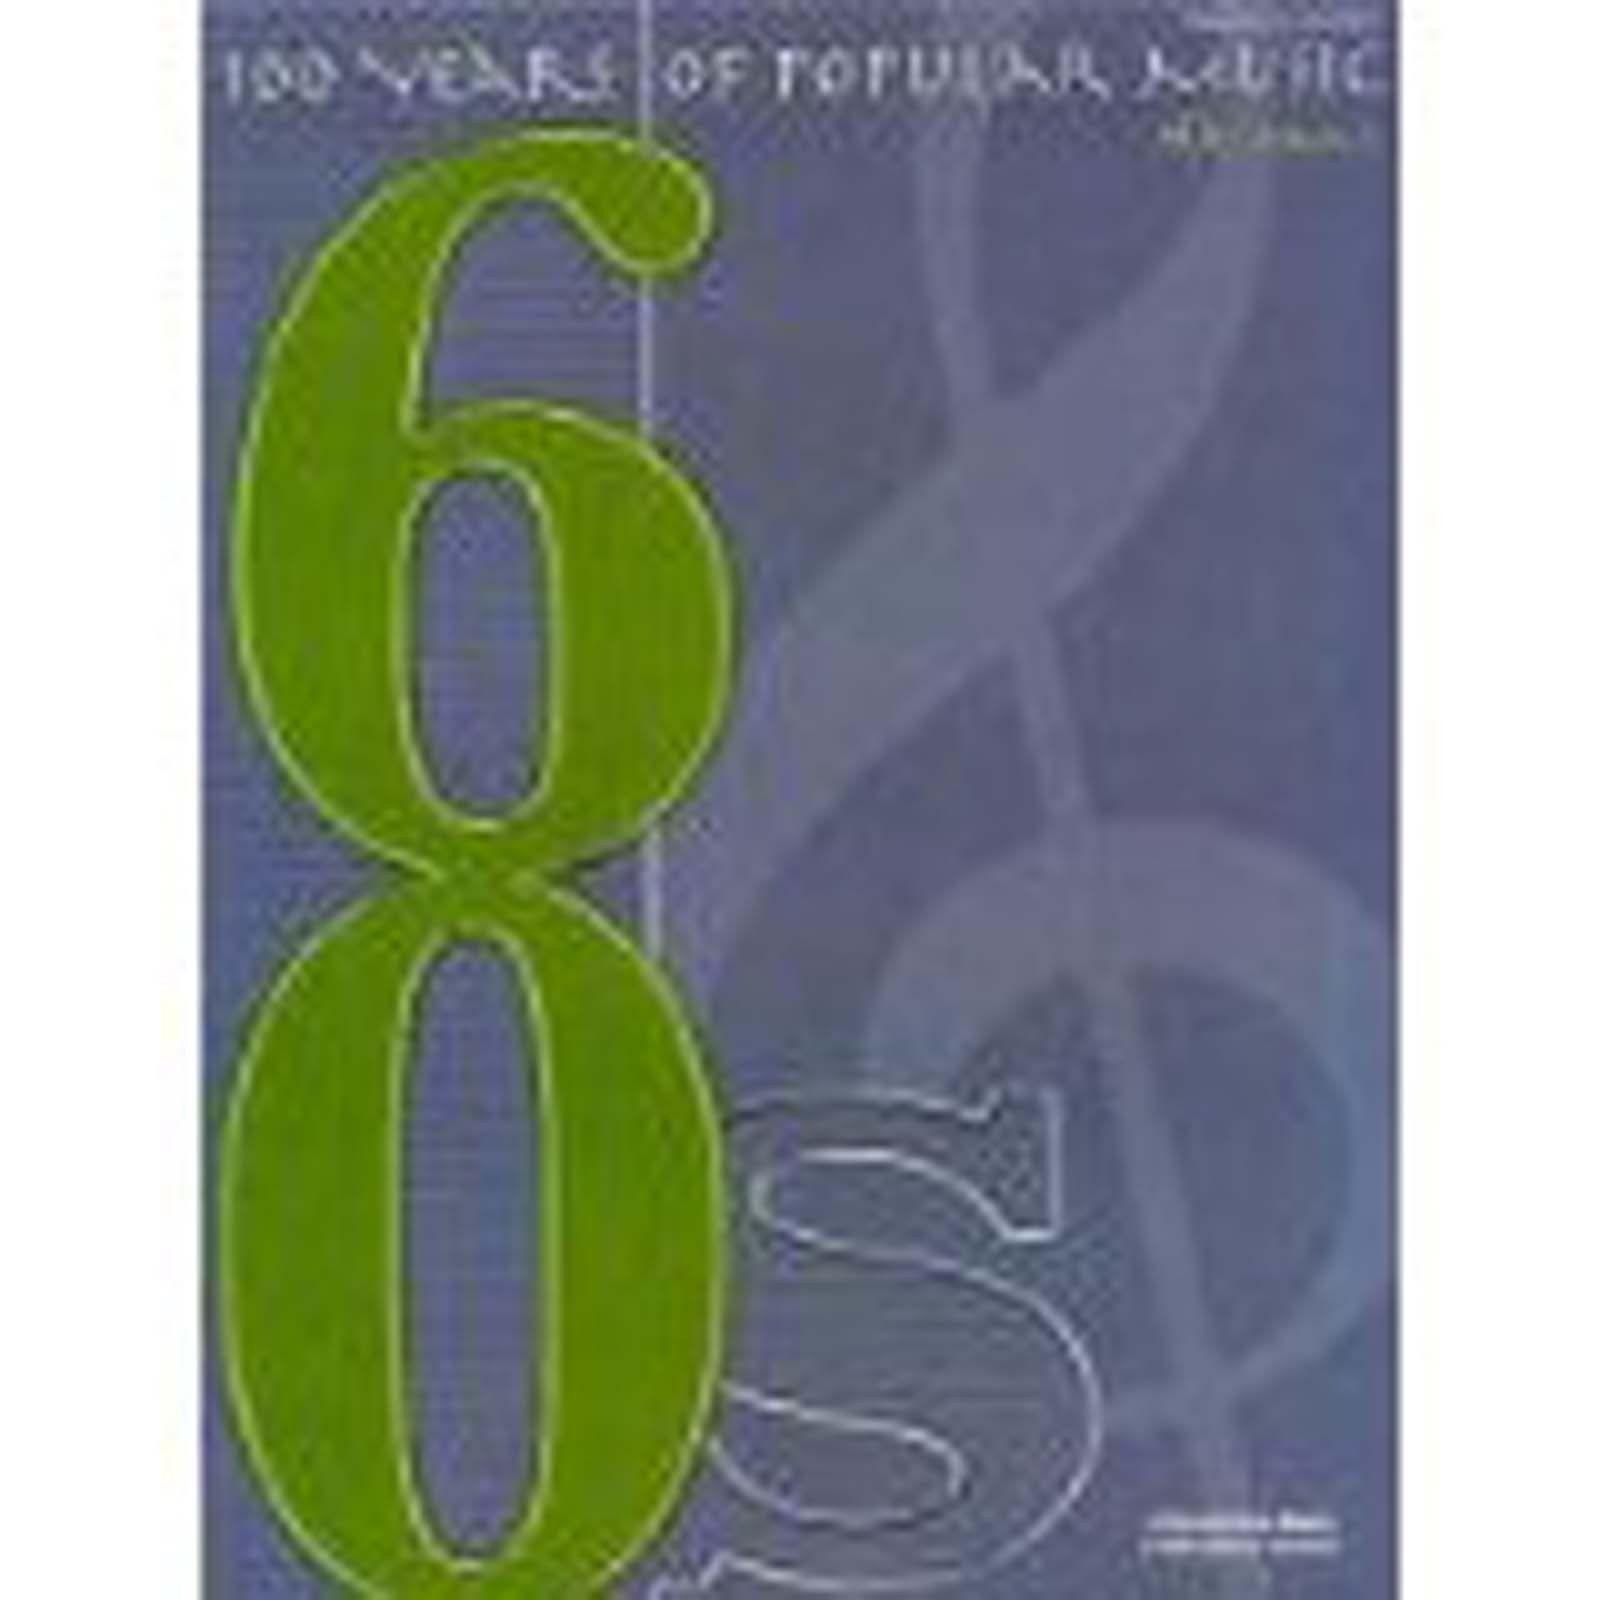 100 Years Of Popular Music 60s Sixties Piano Vocal Guitar Sheet Music Book B73